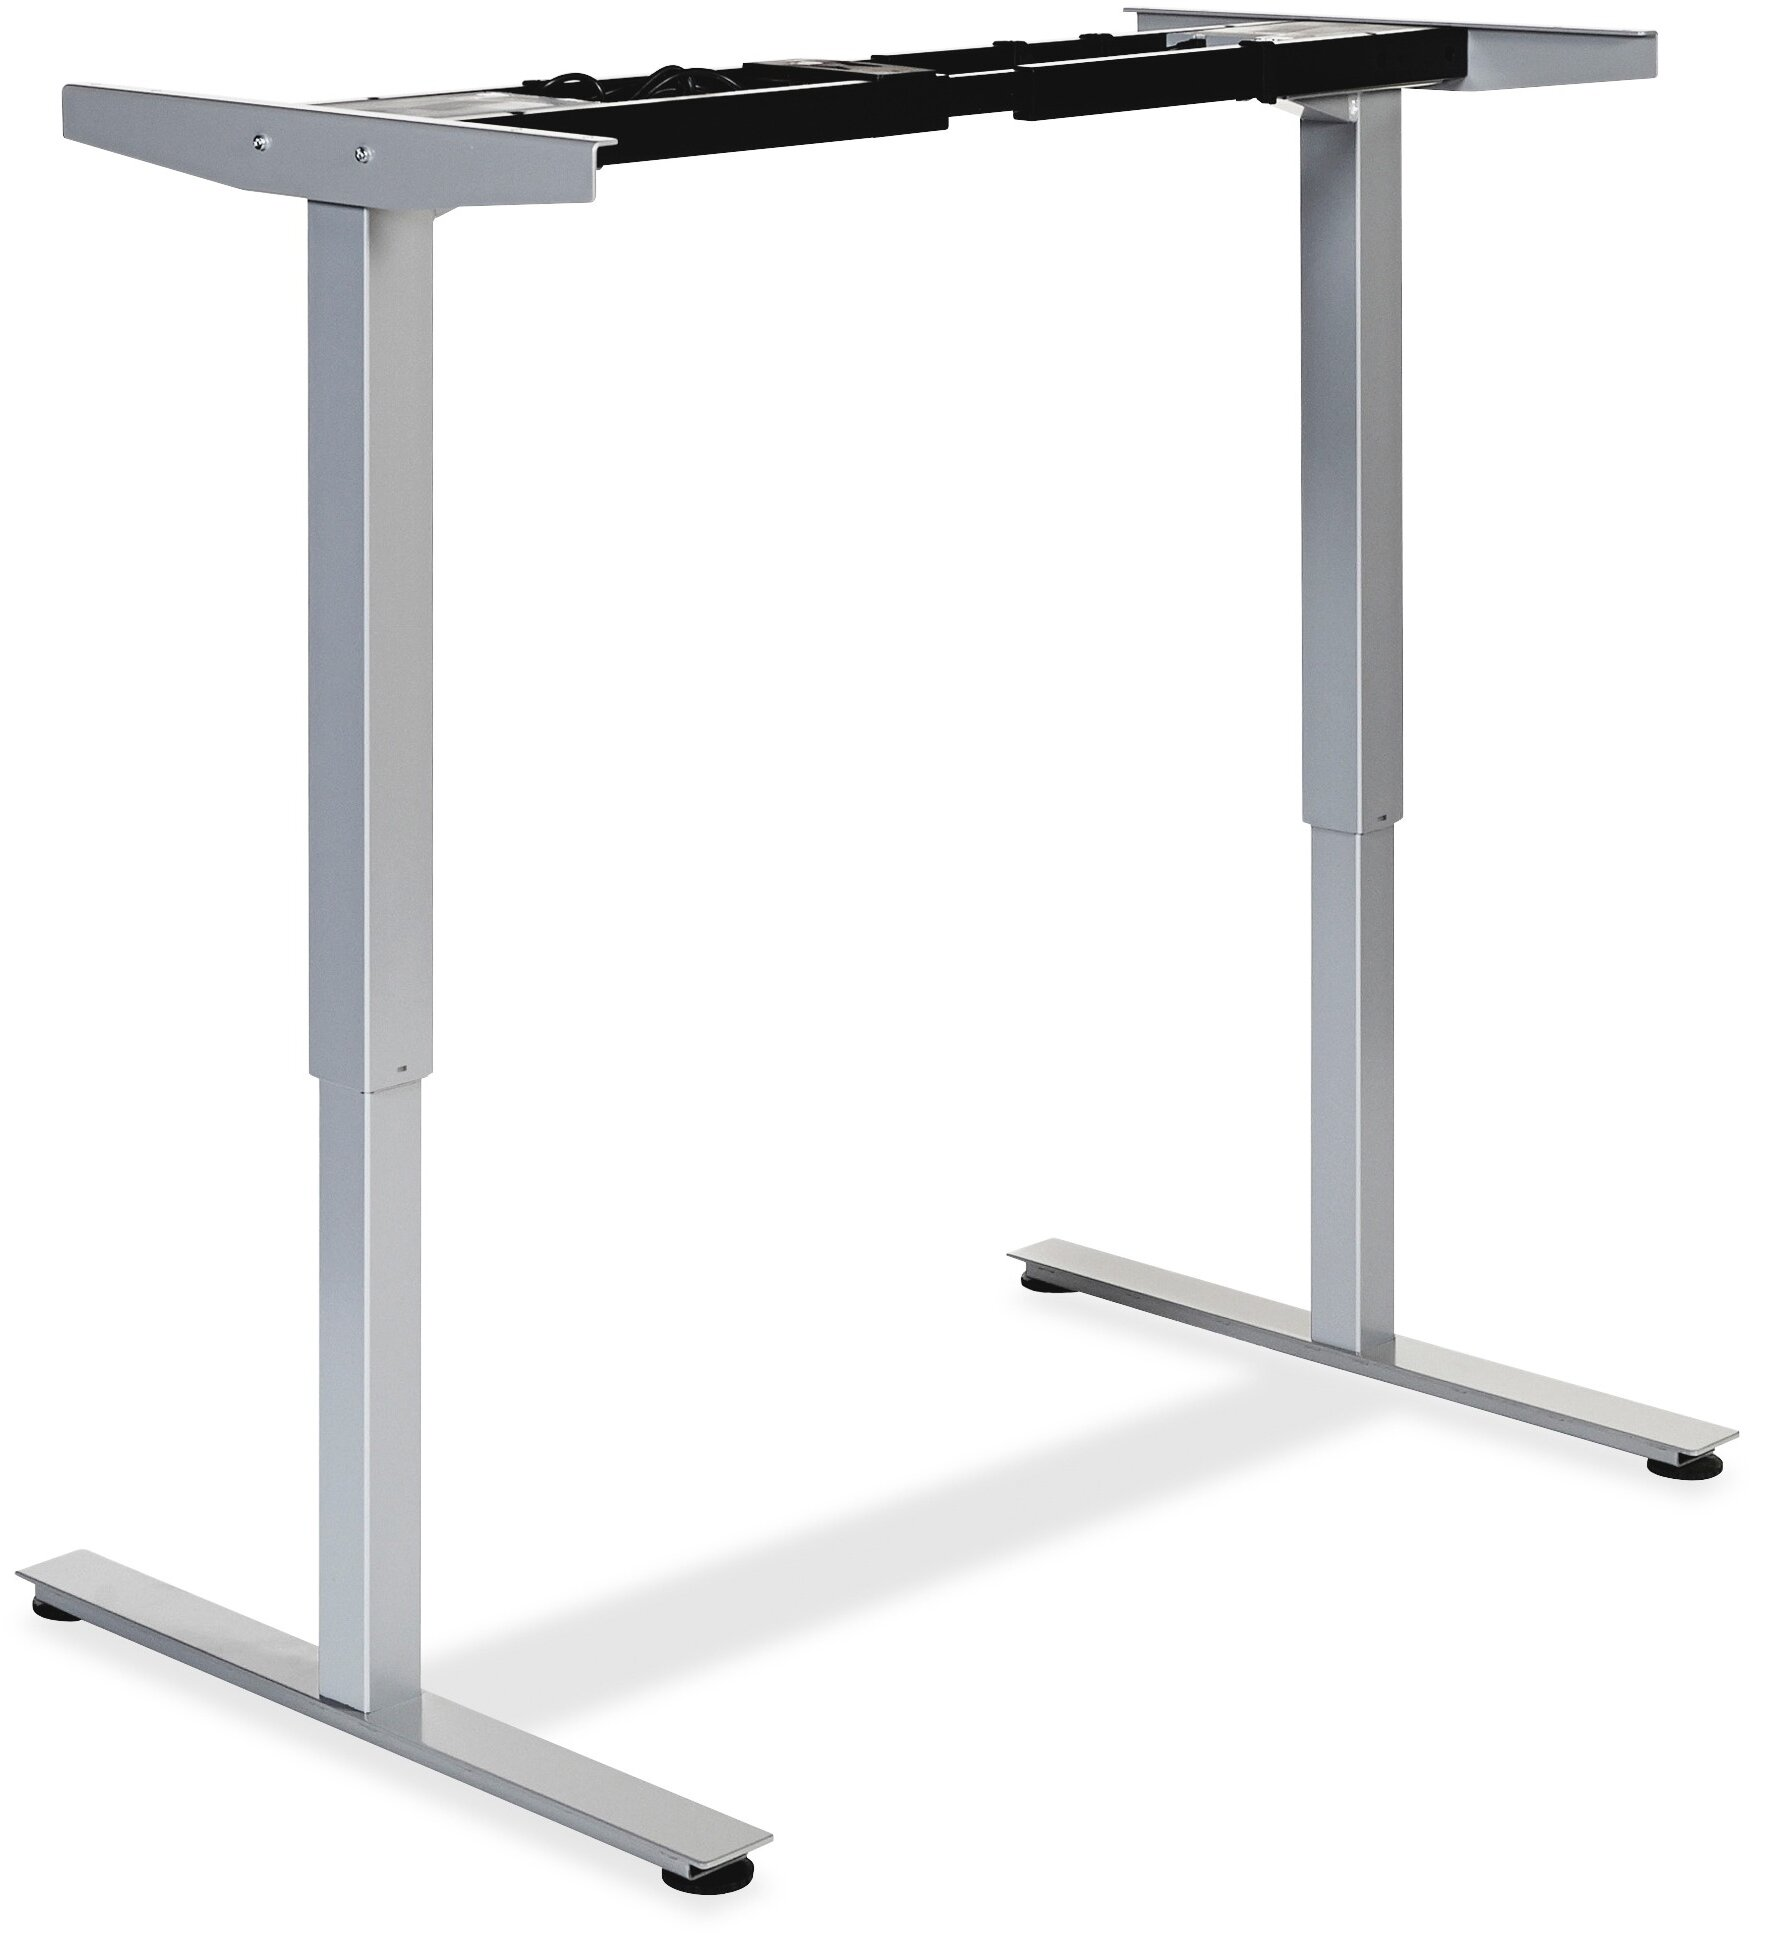 Lorell Electric Height Adjustable Sit Stand Desk Frame | Wayfair